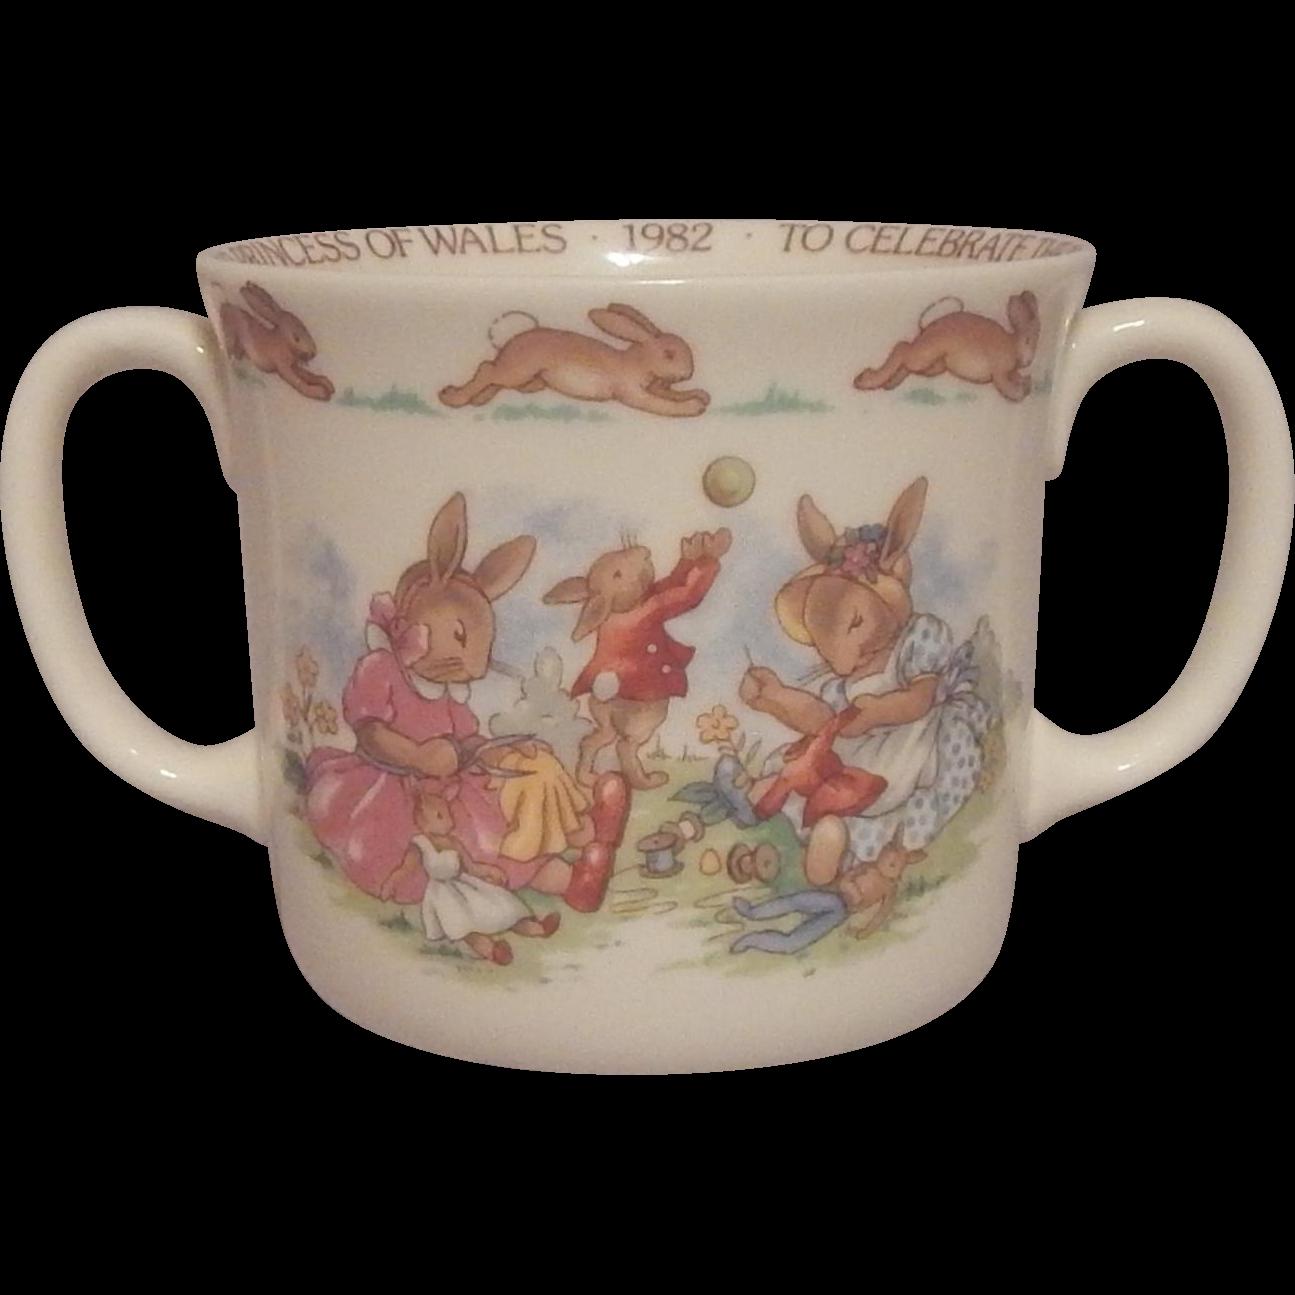 Royal Doulton Bunnykins Mug Commemorative Birth of Prince WIlliam